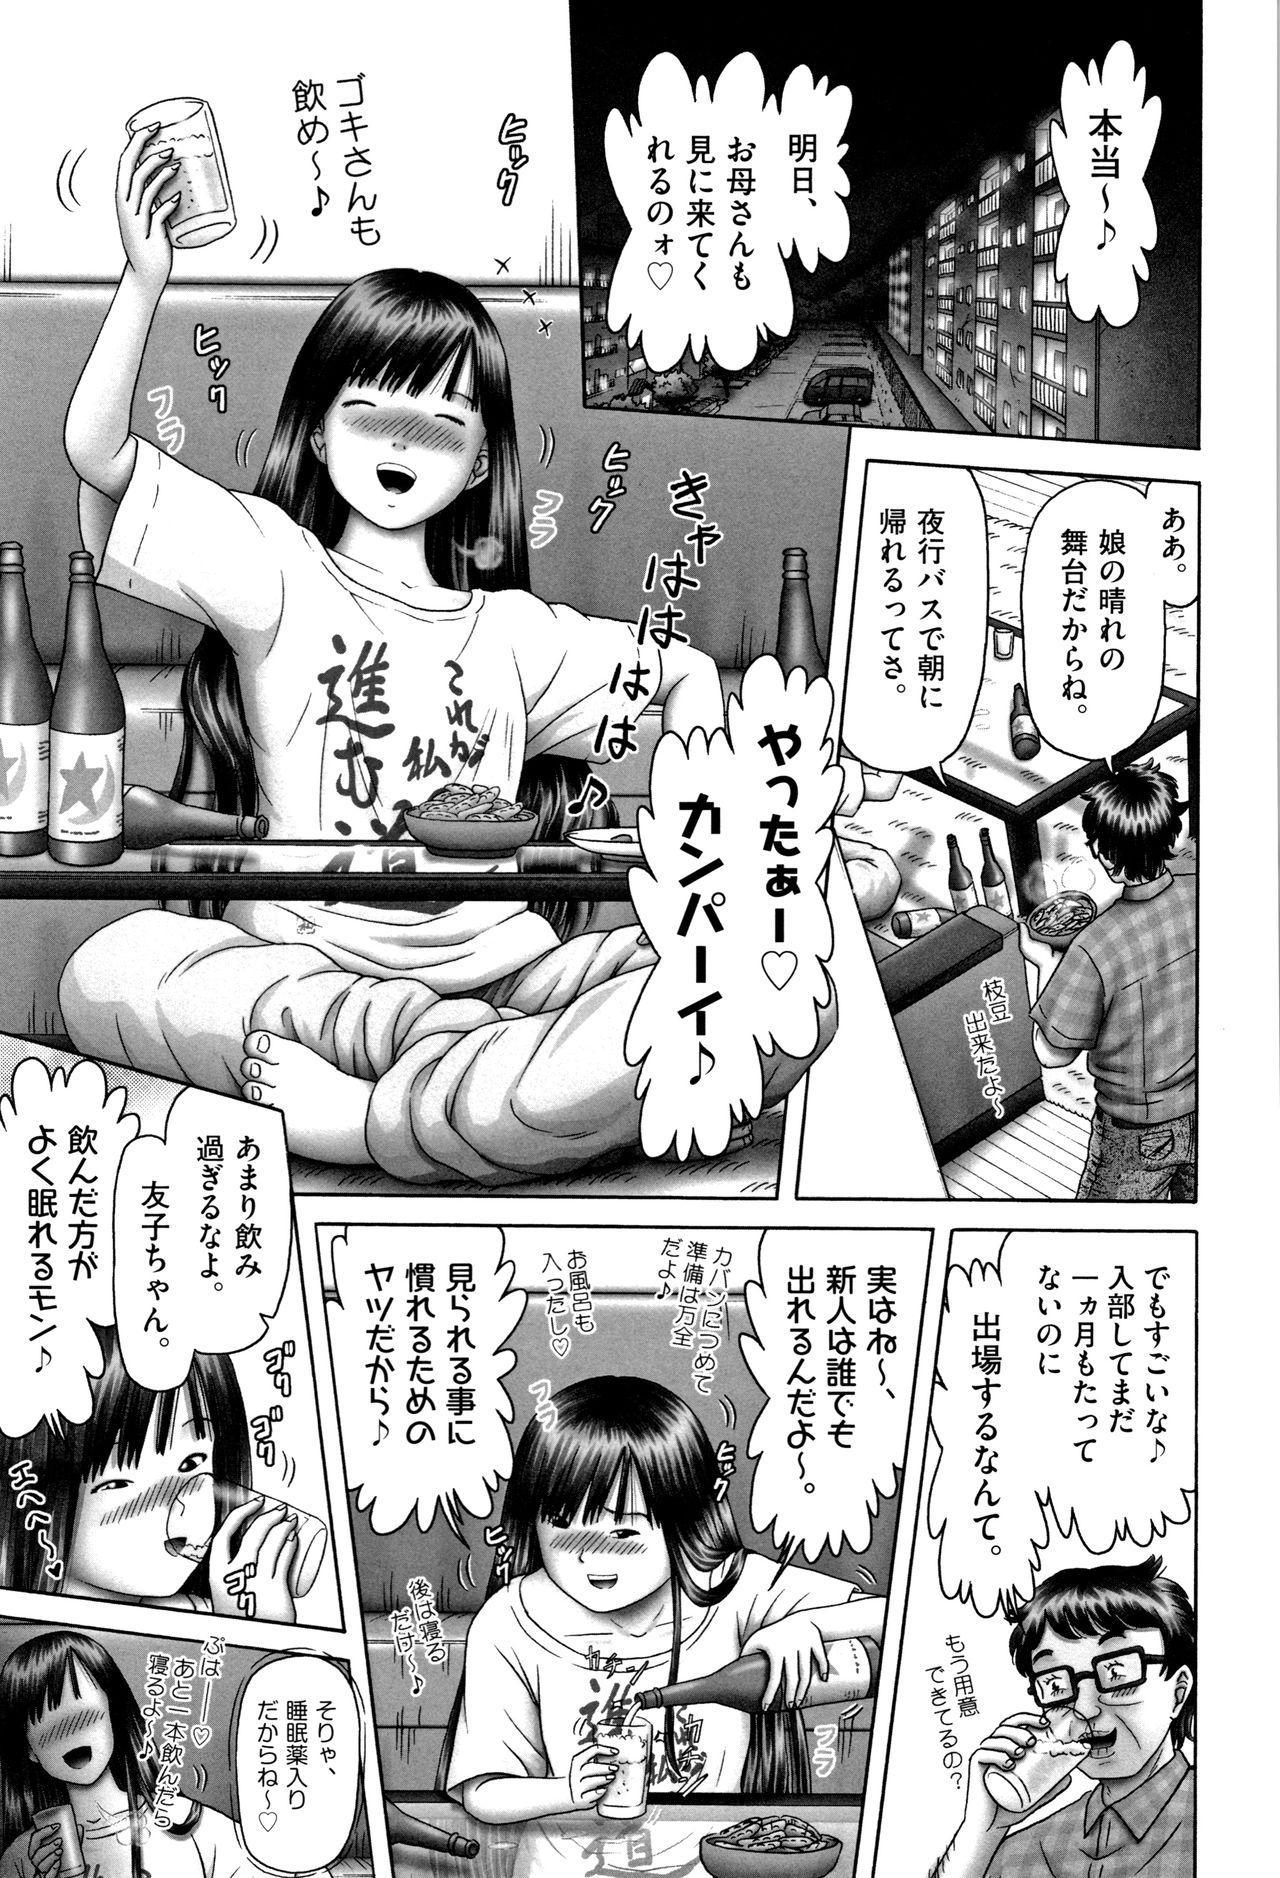 Shoujo Kumikyoku 11 53